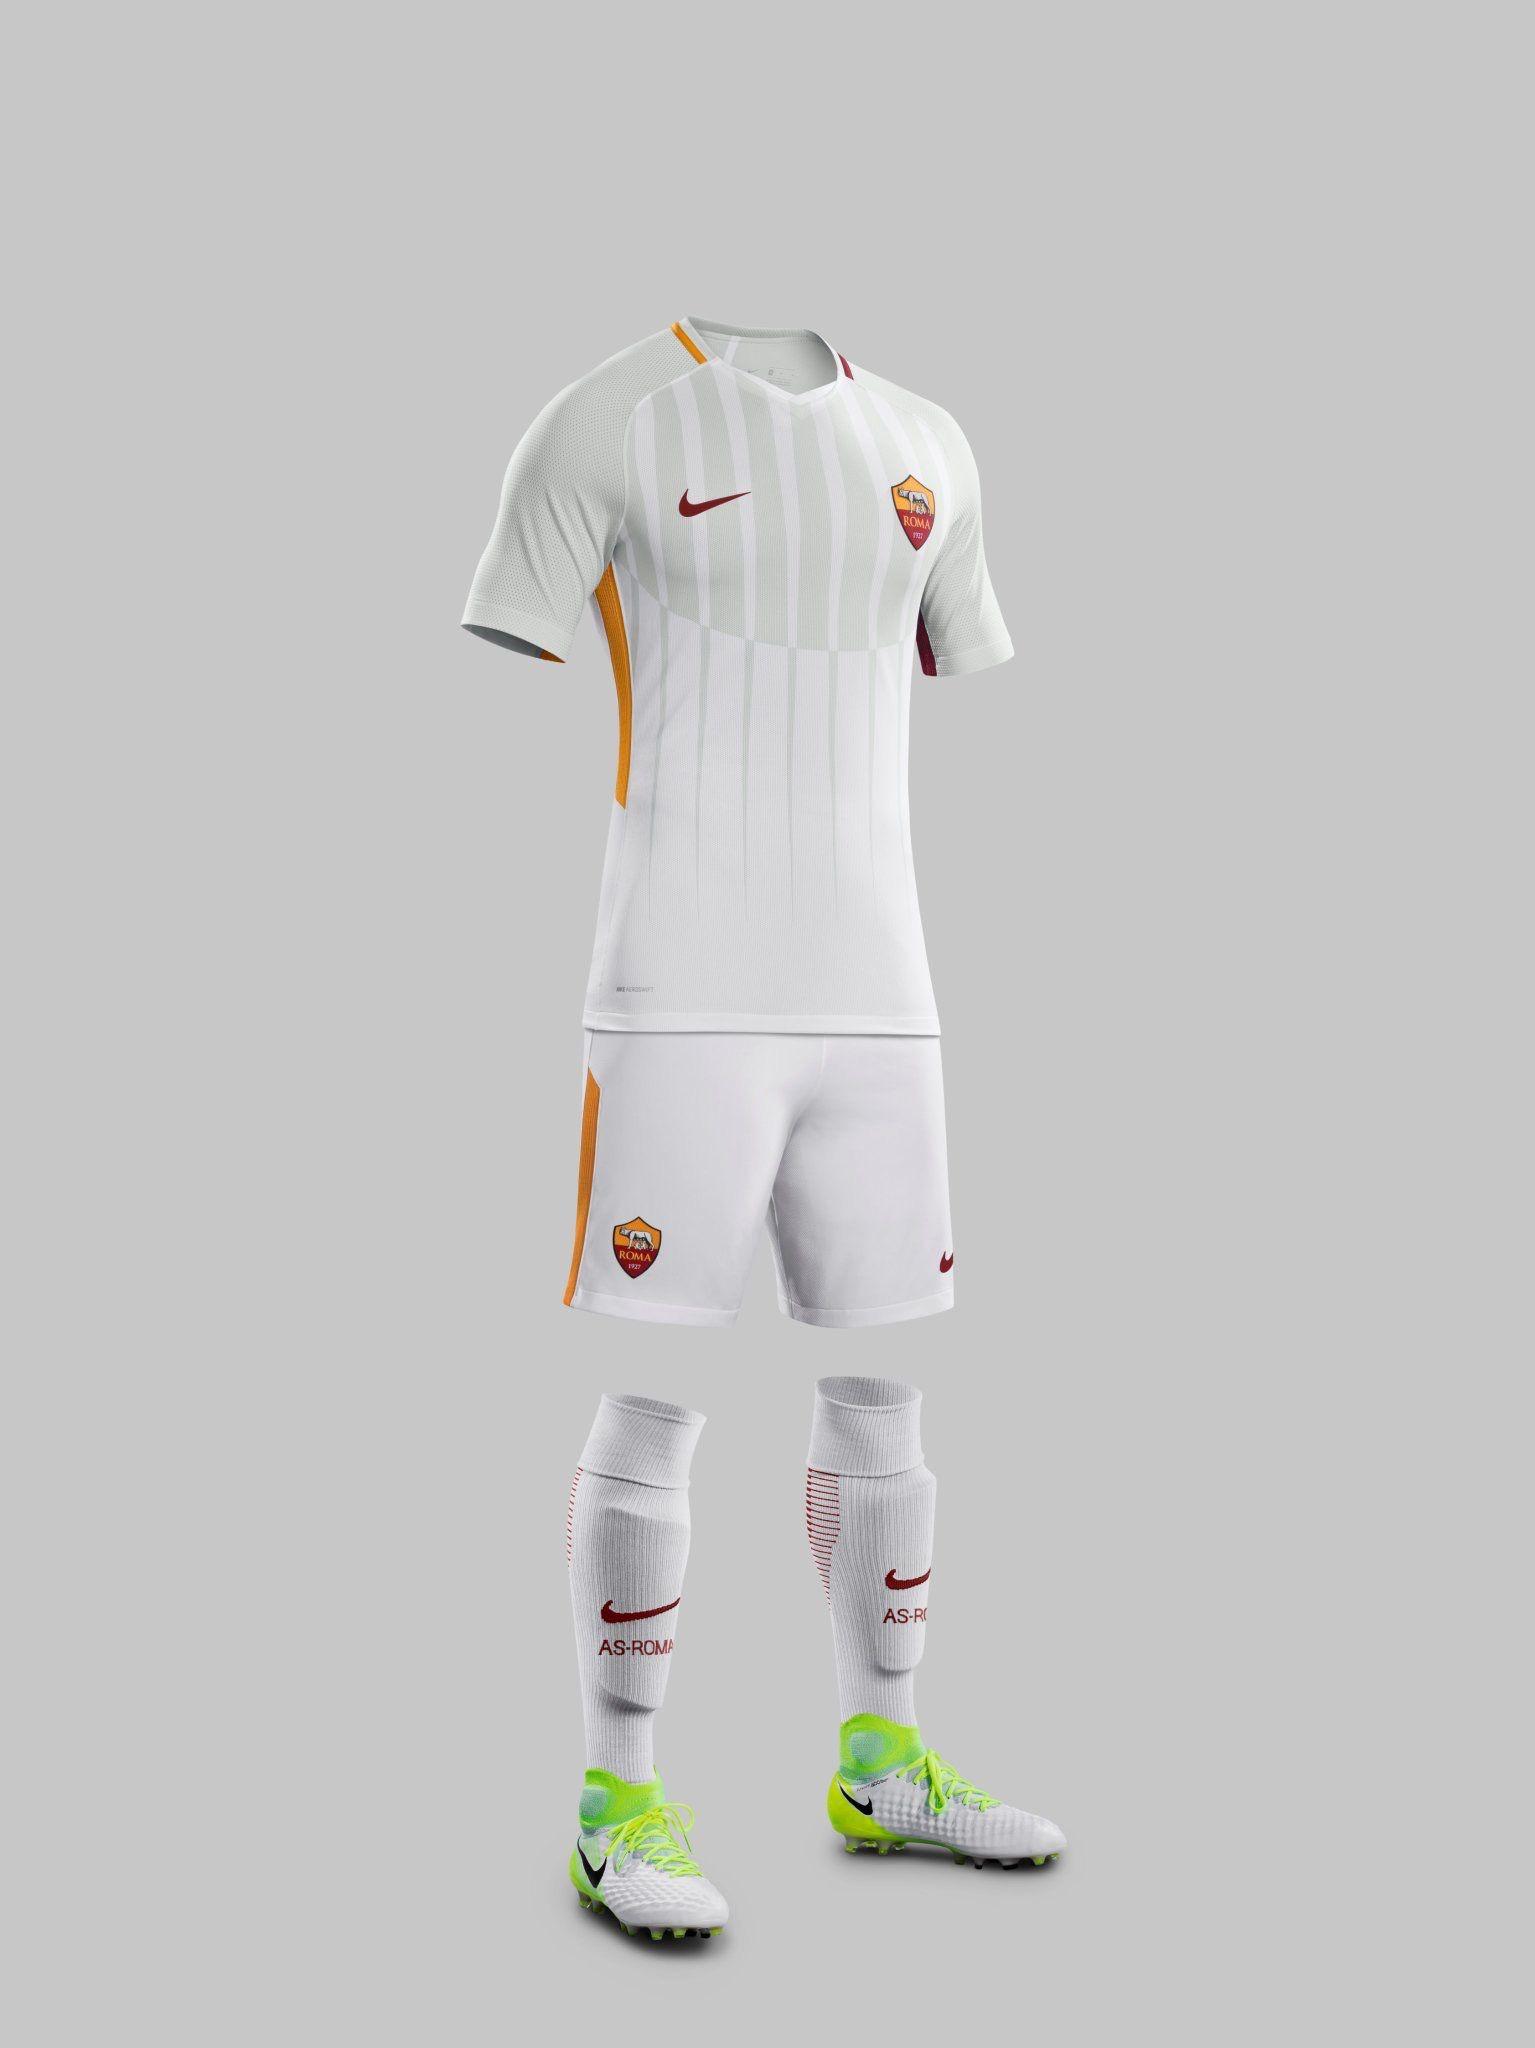 5ea85807e3f AS Roma 2017 2018 Away Kit